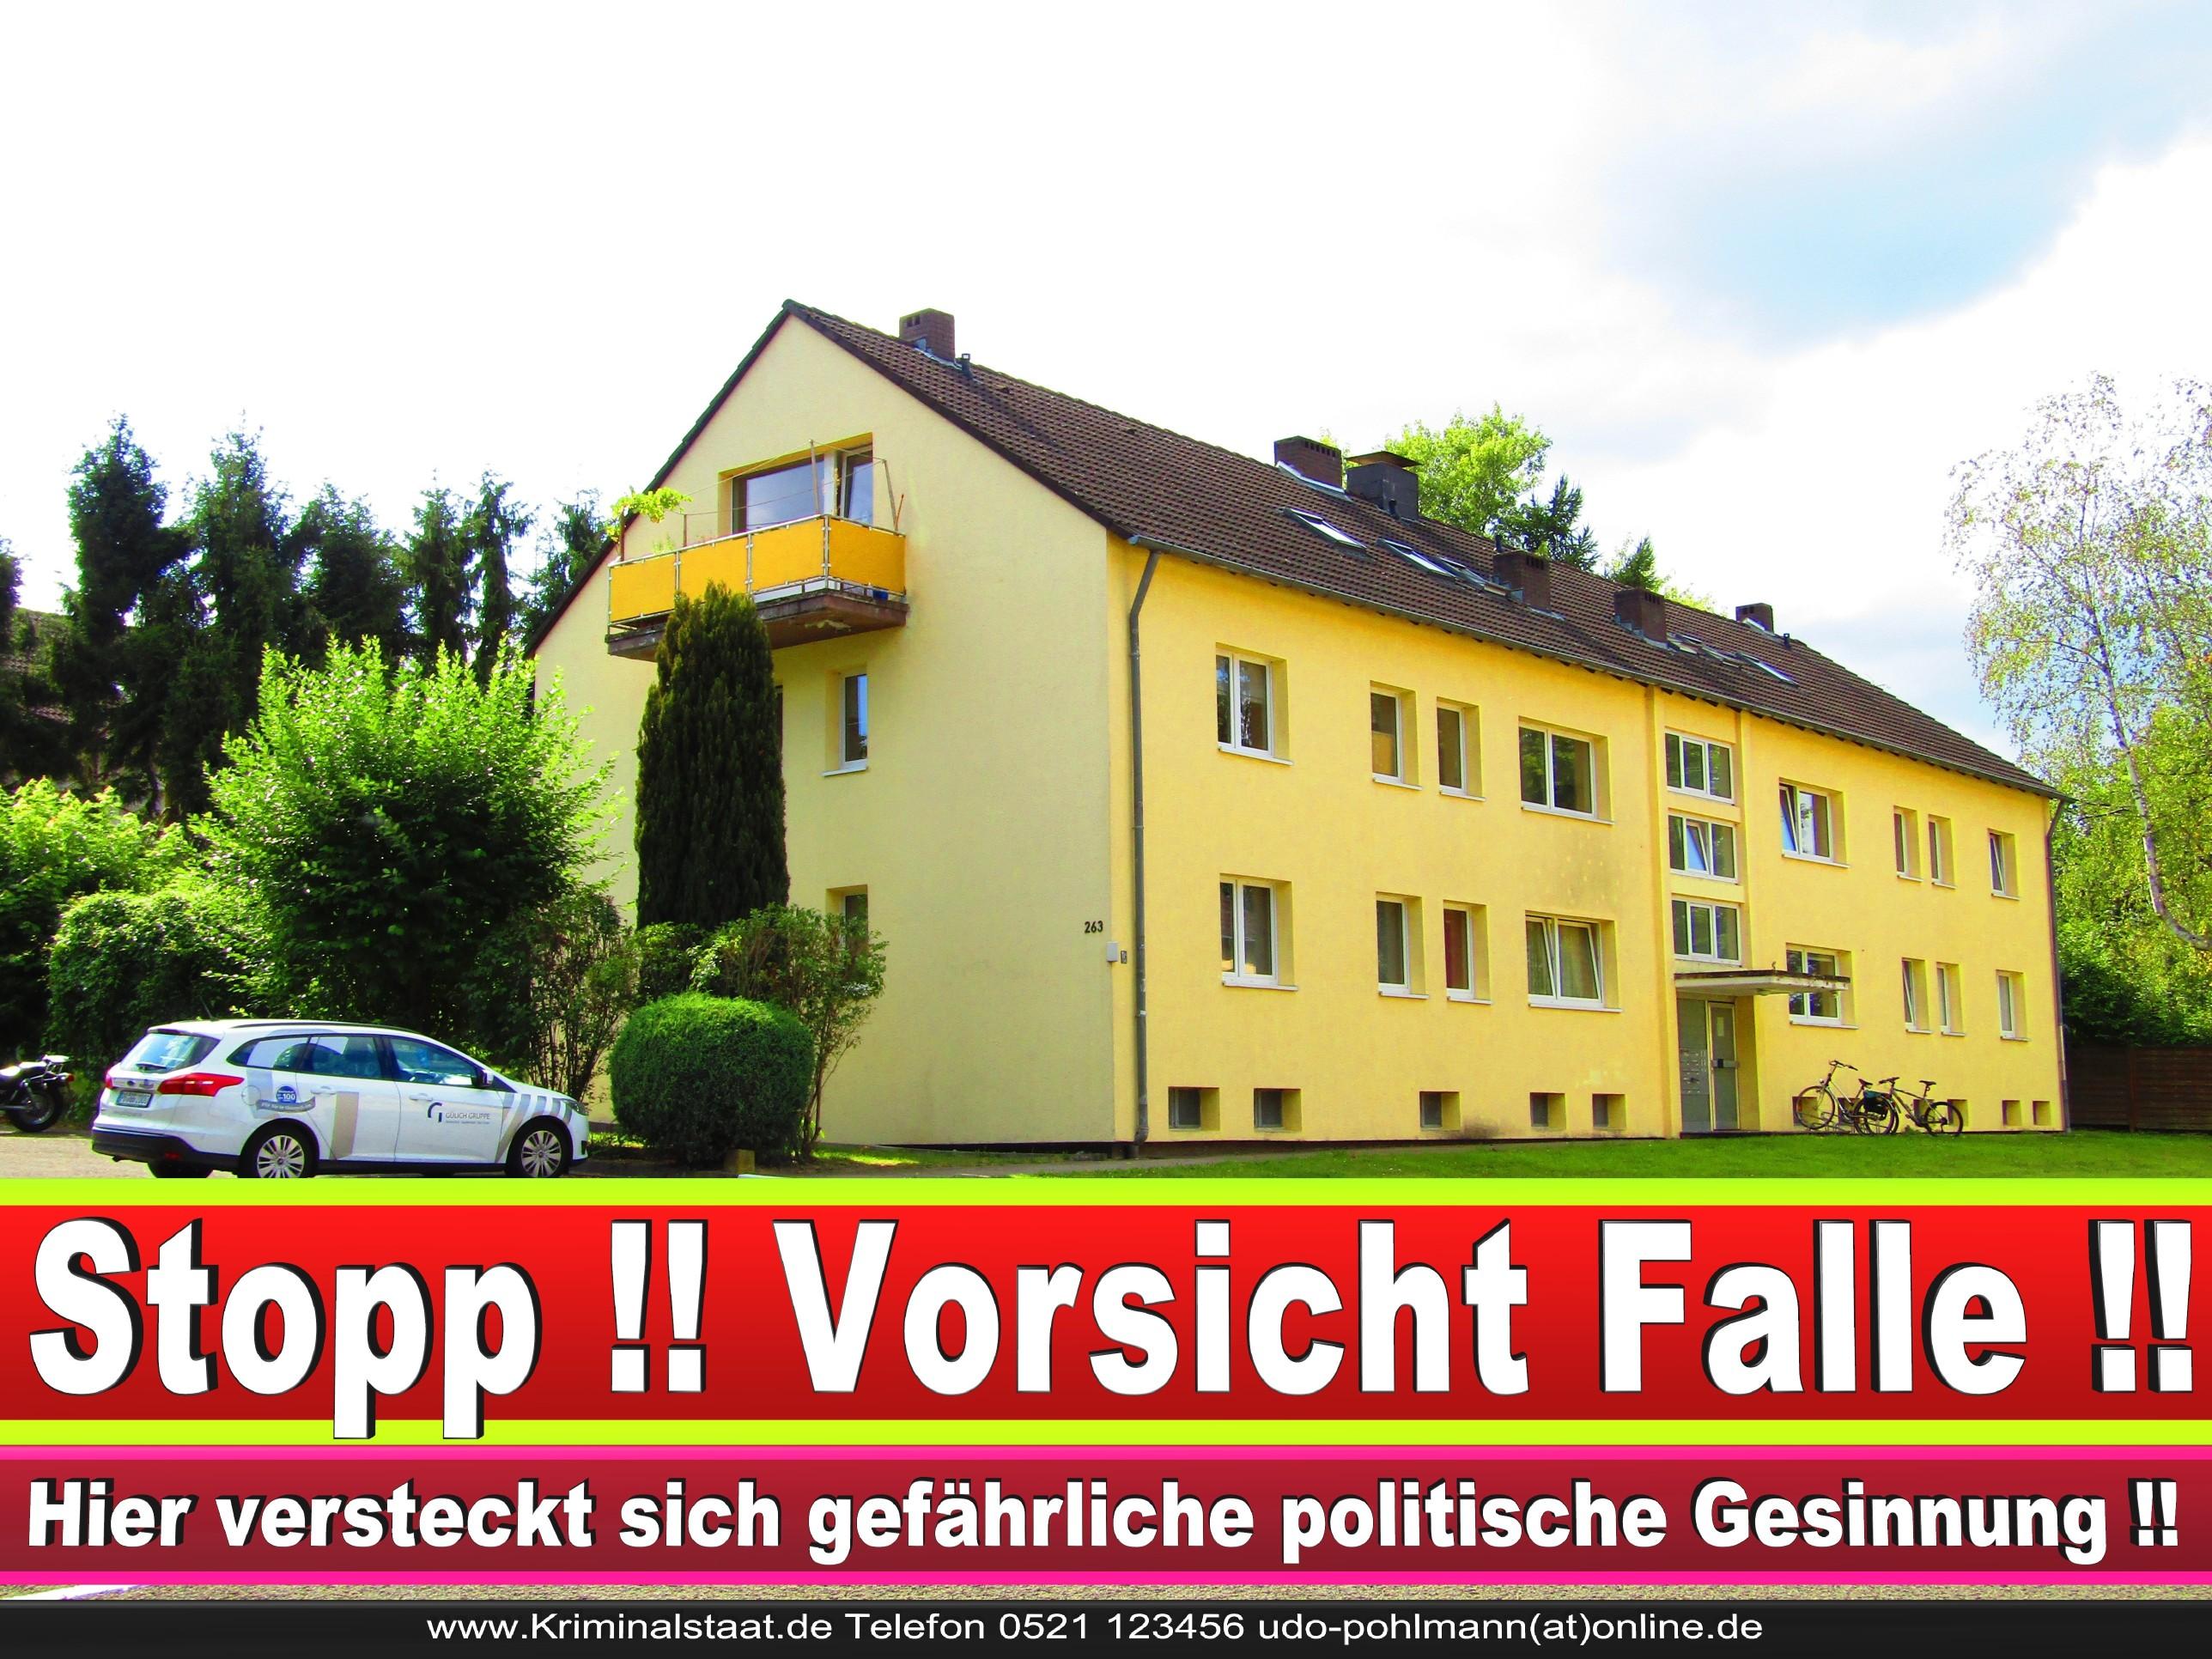 WILLI BLUMENSAAT CDU BIELEFELD 7 LANDTAGSWAHL BUNDESTAGSWAHL BÜRGERMEISTERWAHL